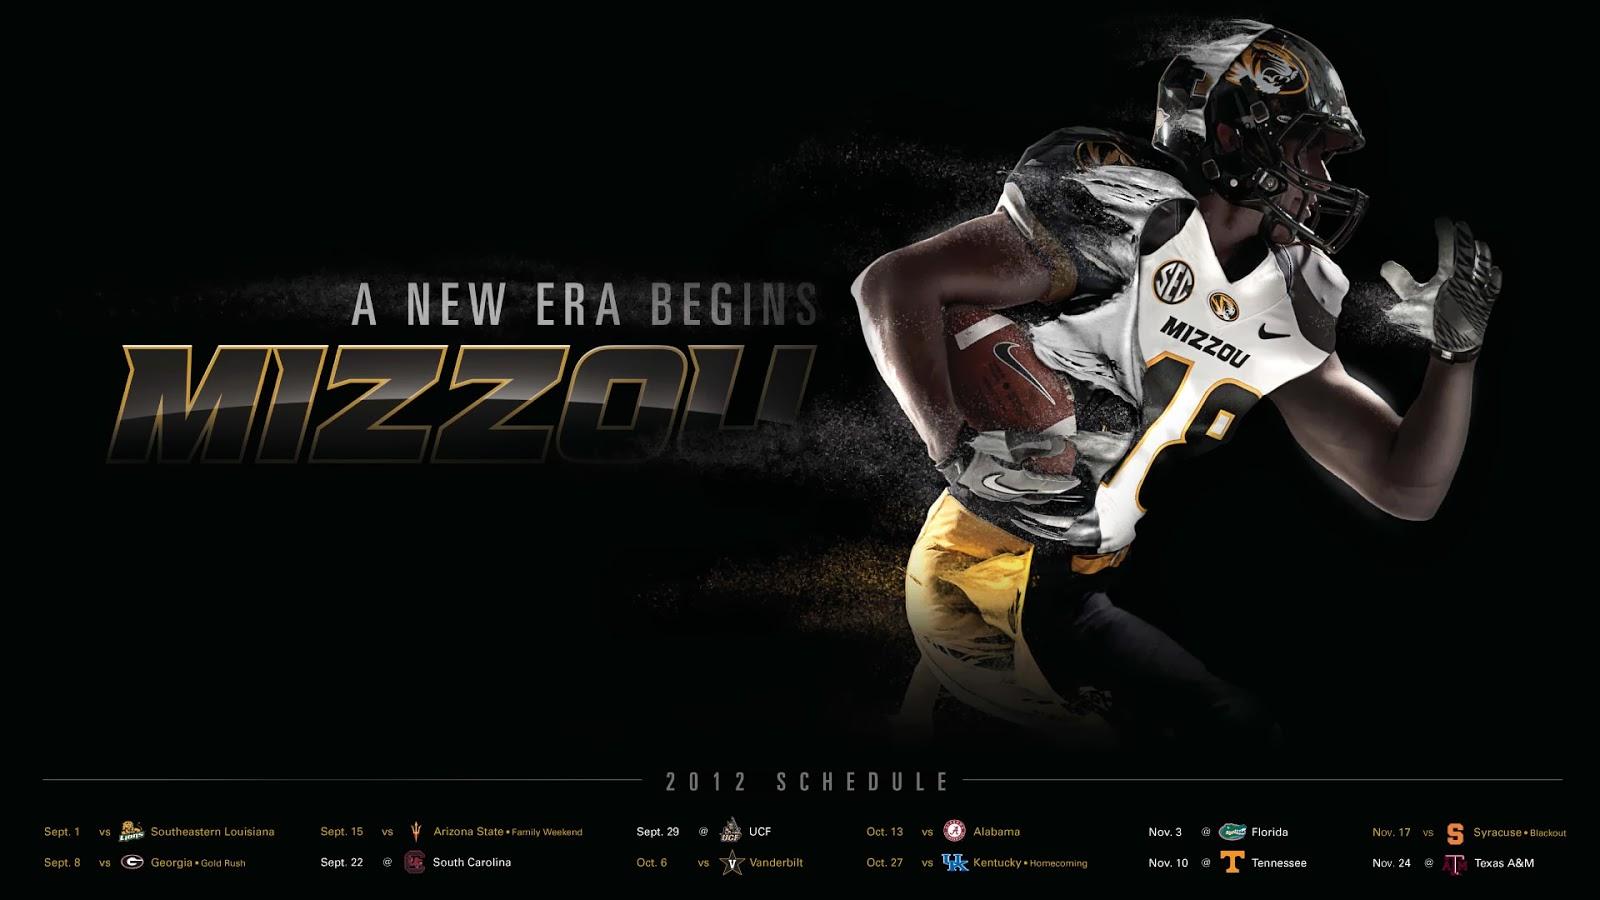 Mizzou Football Wallpapers   HD Wallpapers Nice HD Wallpapers 1080p 1600x900